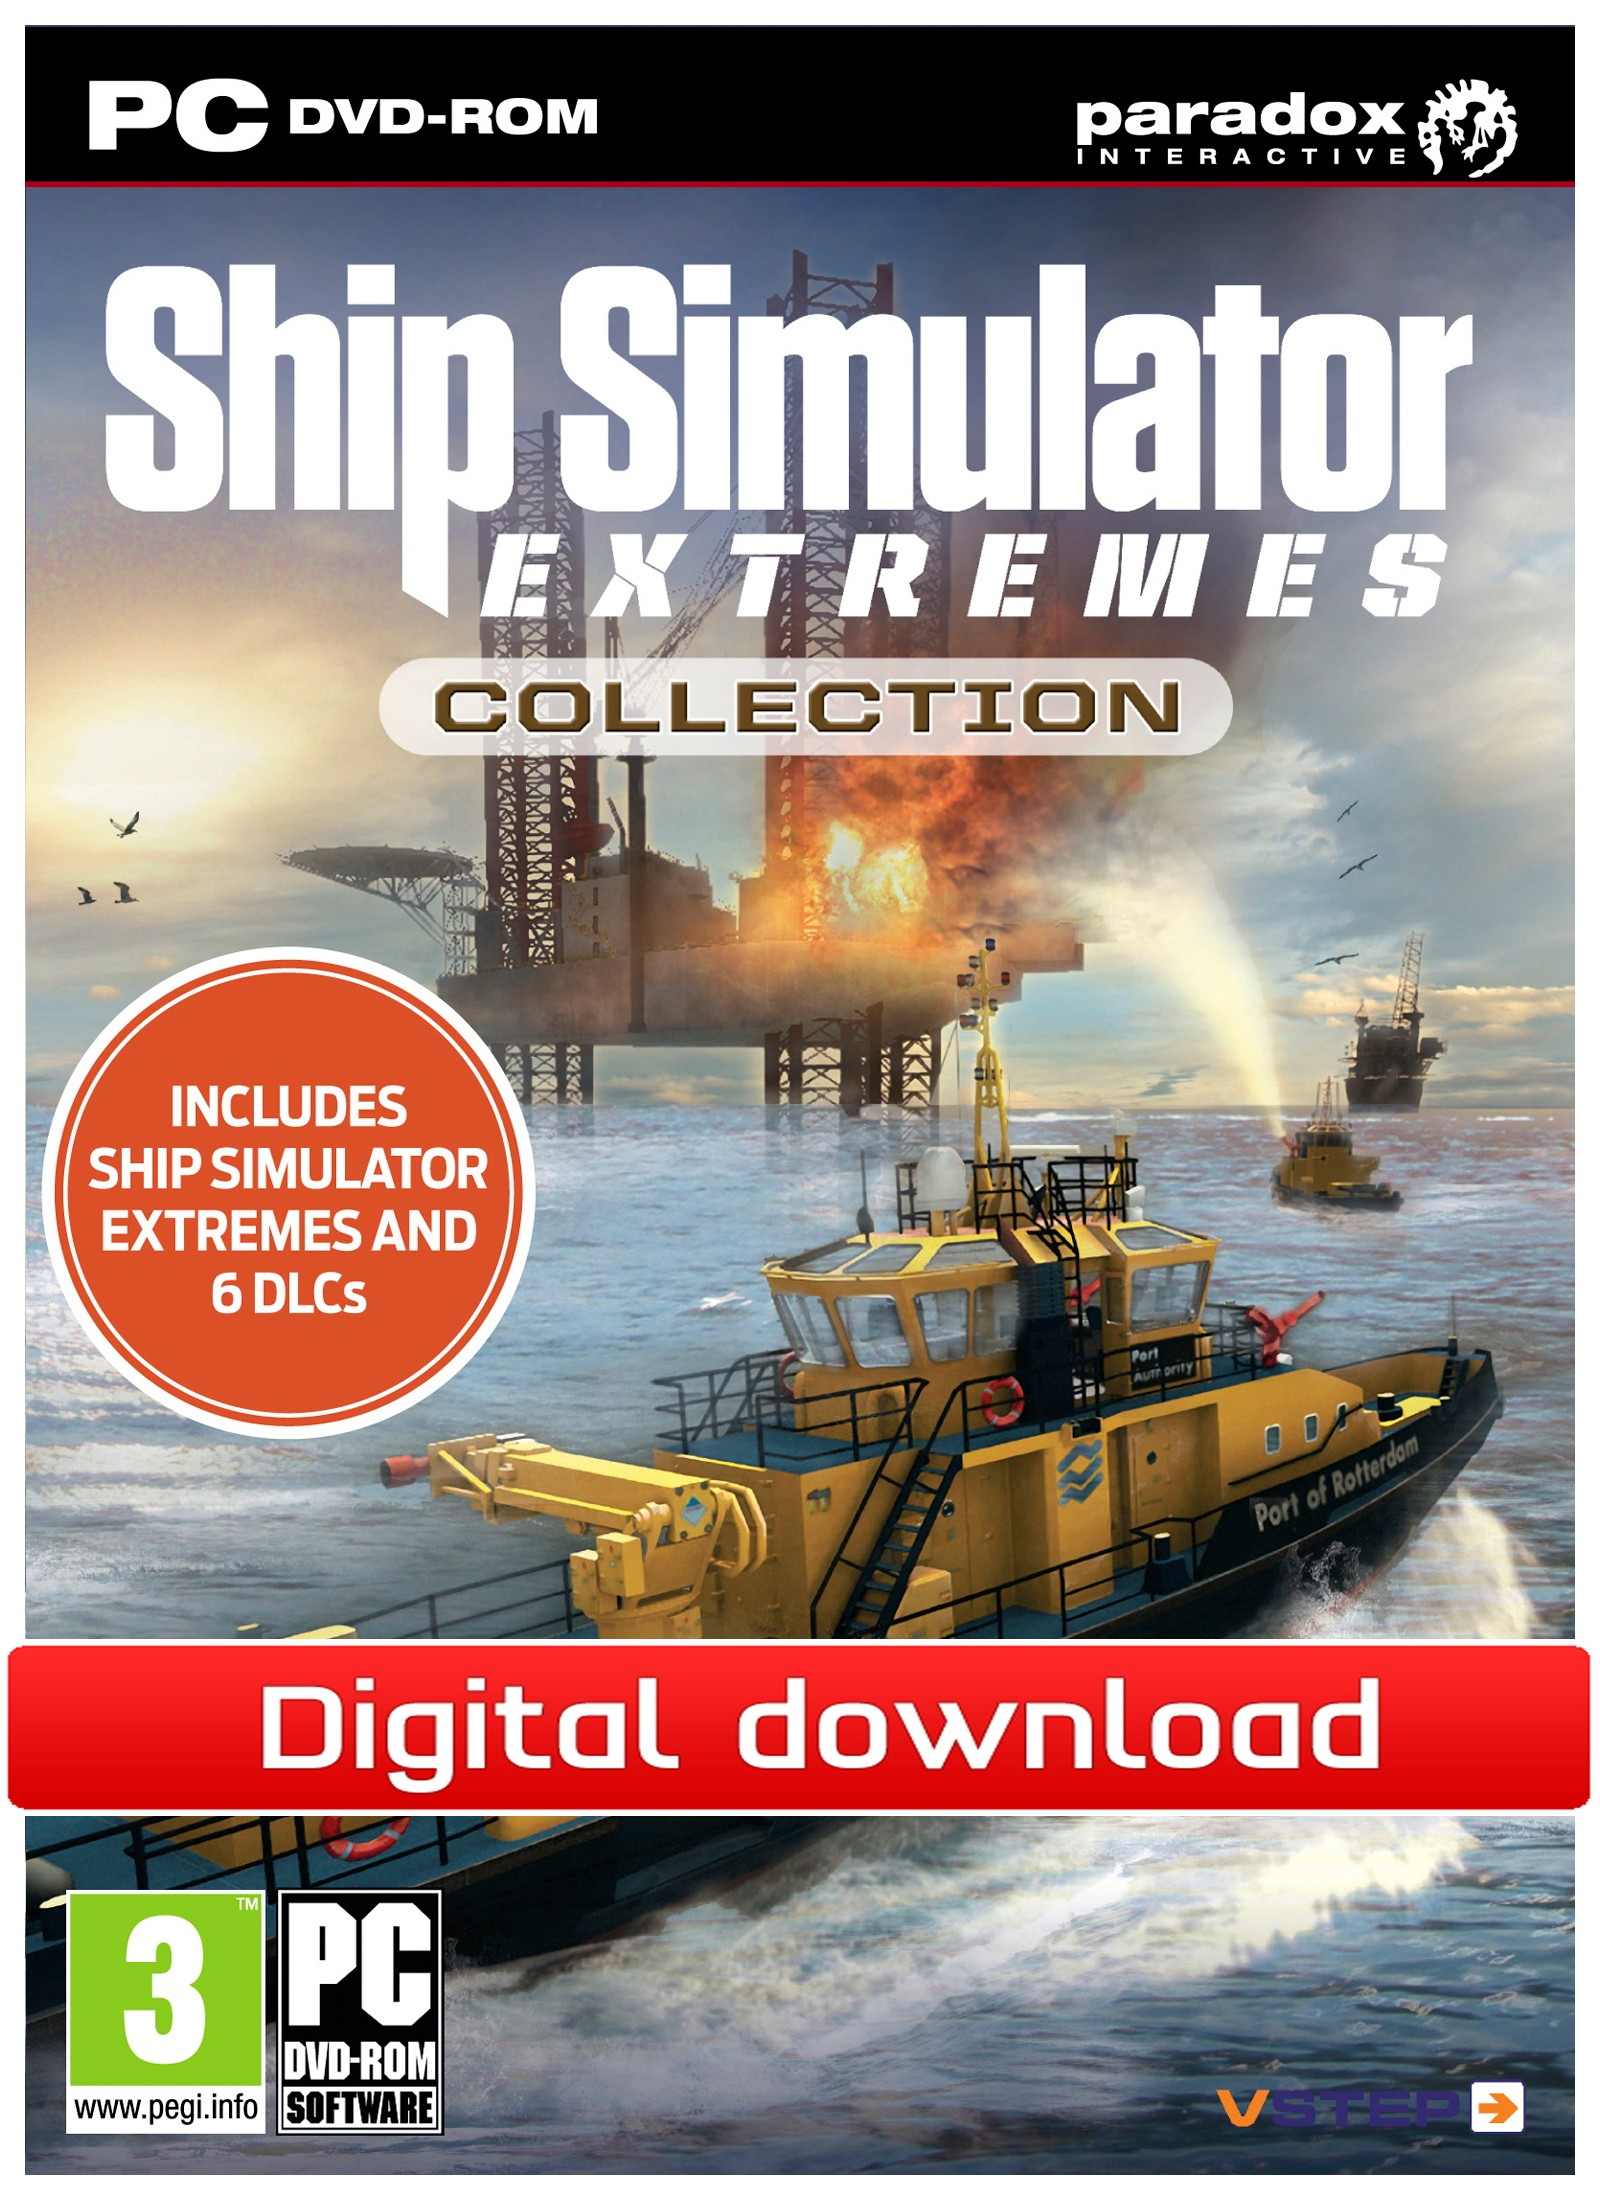 Ship Simulator Extremes Collection (PC nedlastning) PCDD30024